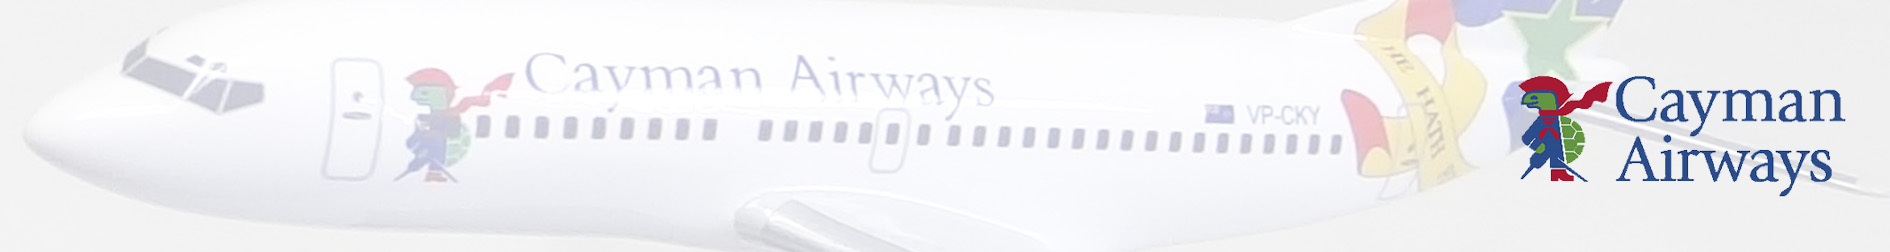 cayman-airways.jpg